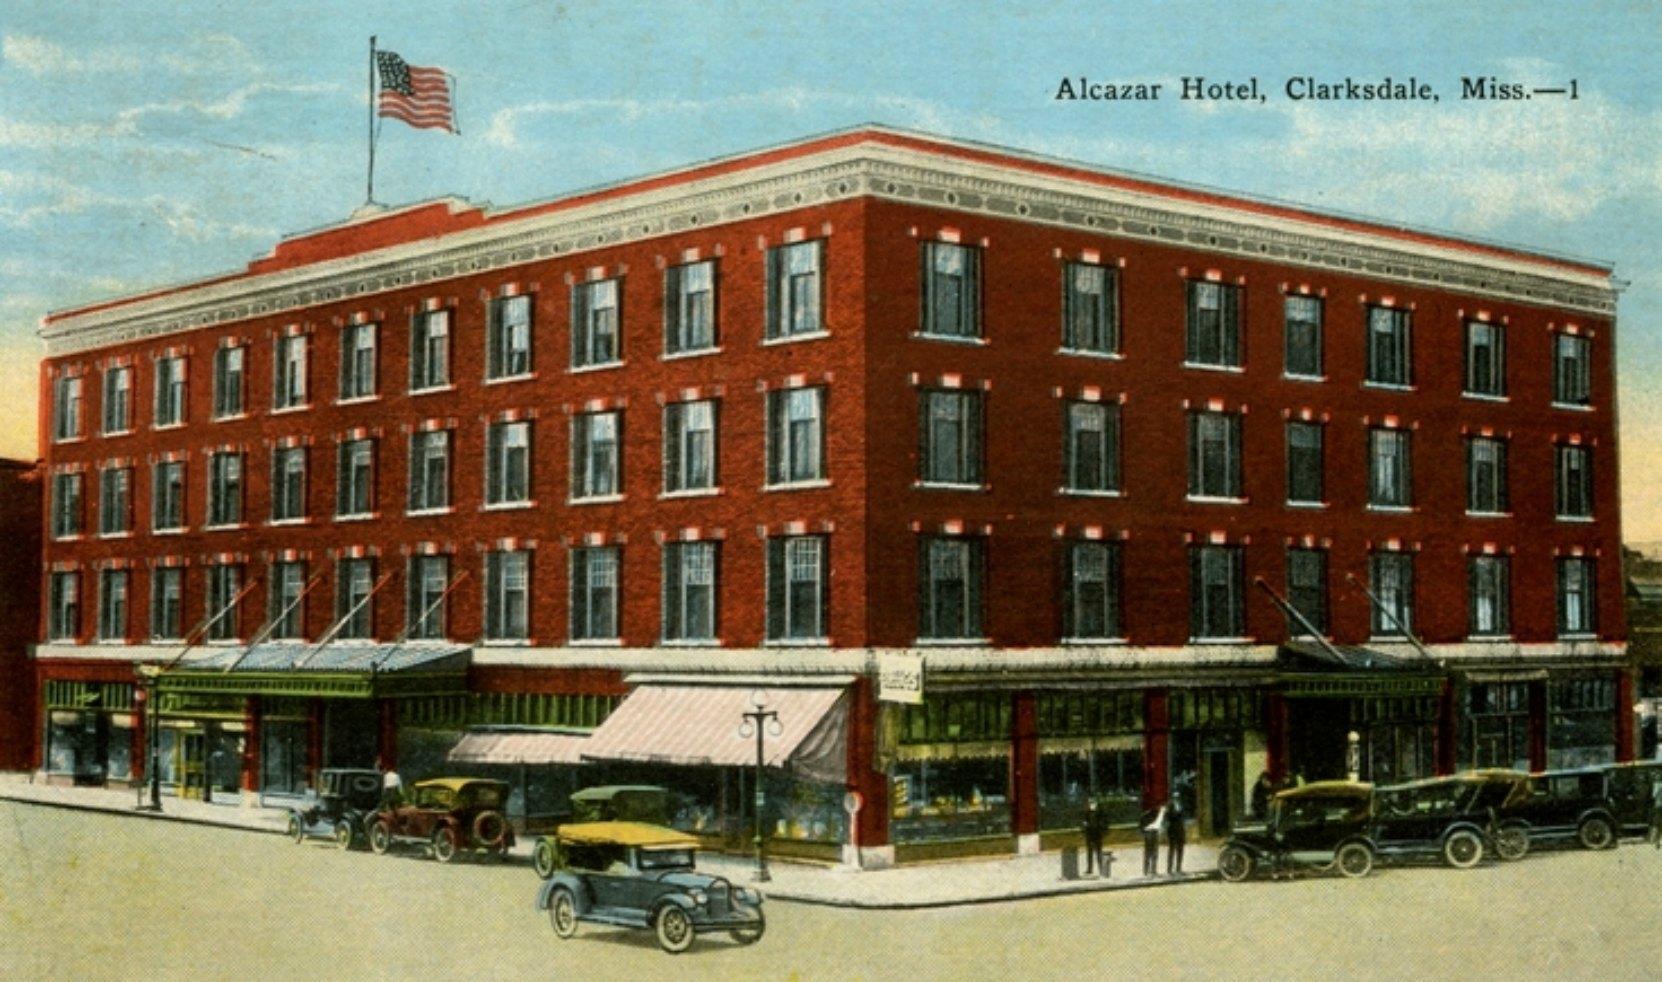 Alcazar Hotel, Clarksdale, Mississippi, circa 1920